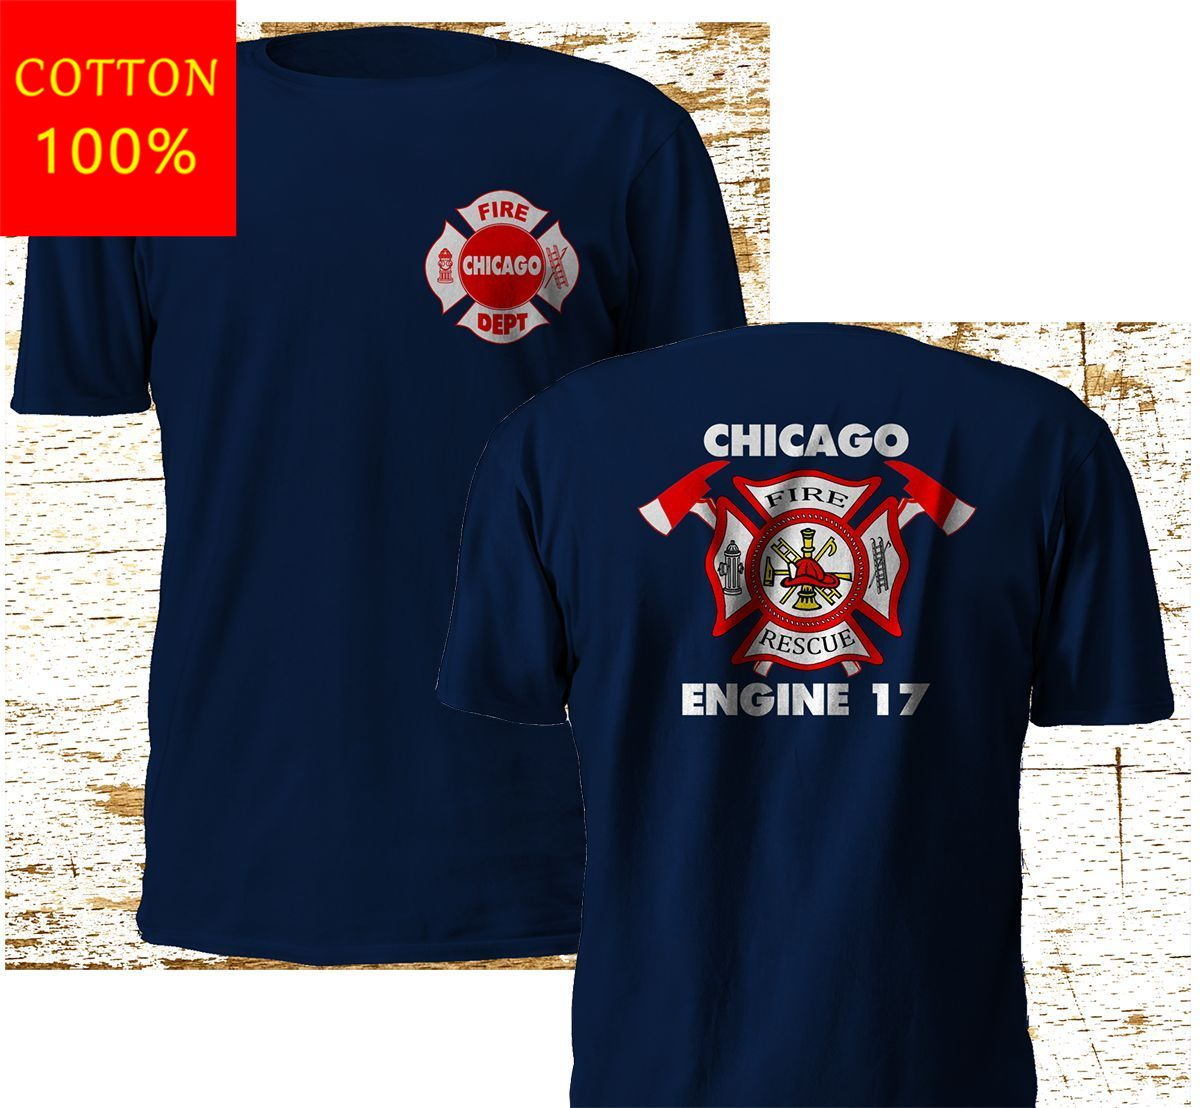 Moda nova chicago bombeiro departamento backdraft motor 17 fogo marinha camiseta m 3xl